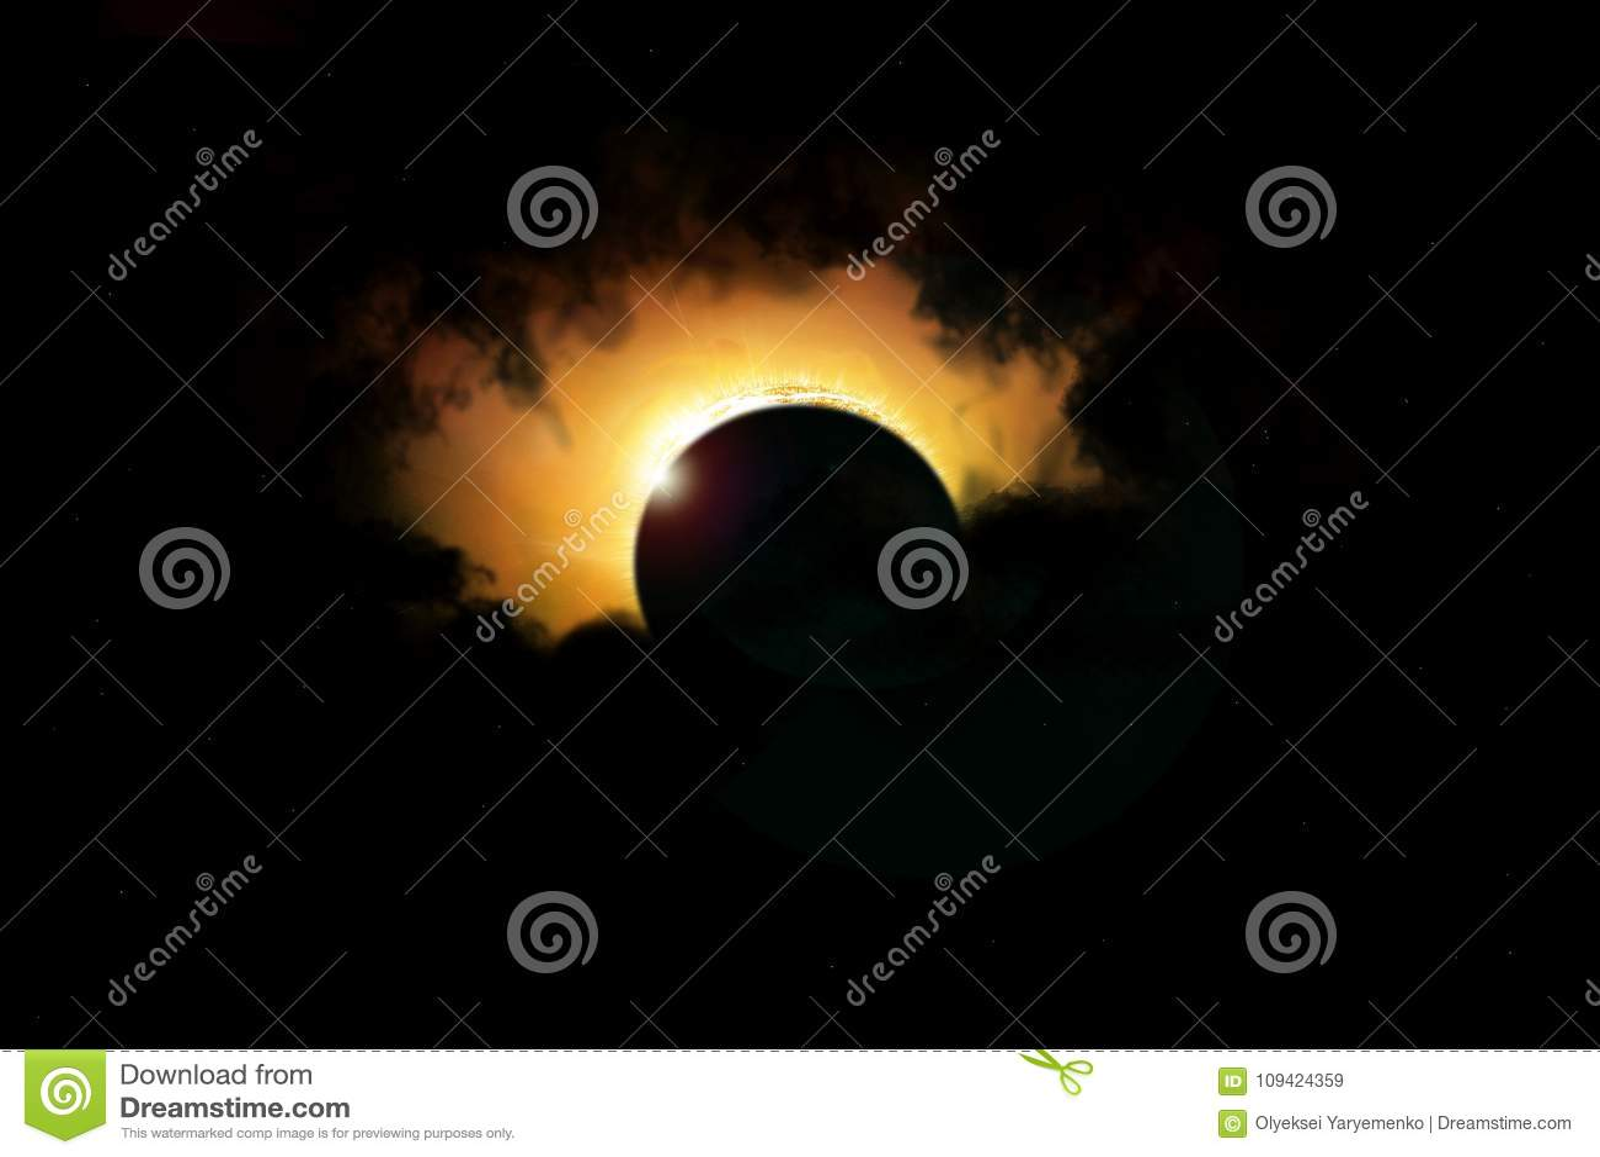 Raum-Sonnenfinsternis Sonnensystem, Sonneneruption, totale Finsternis